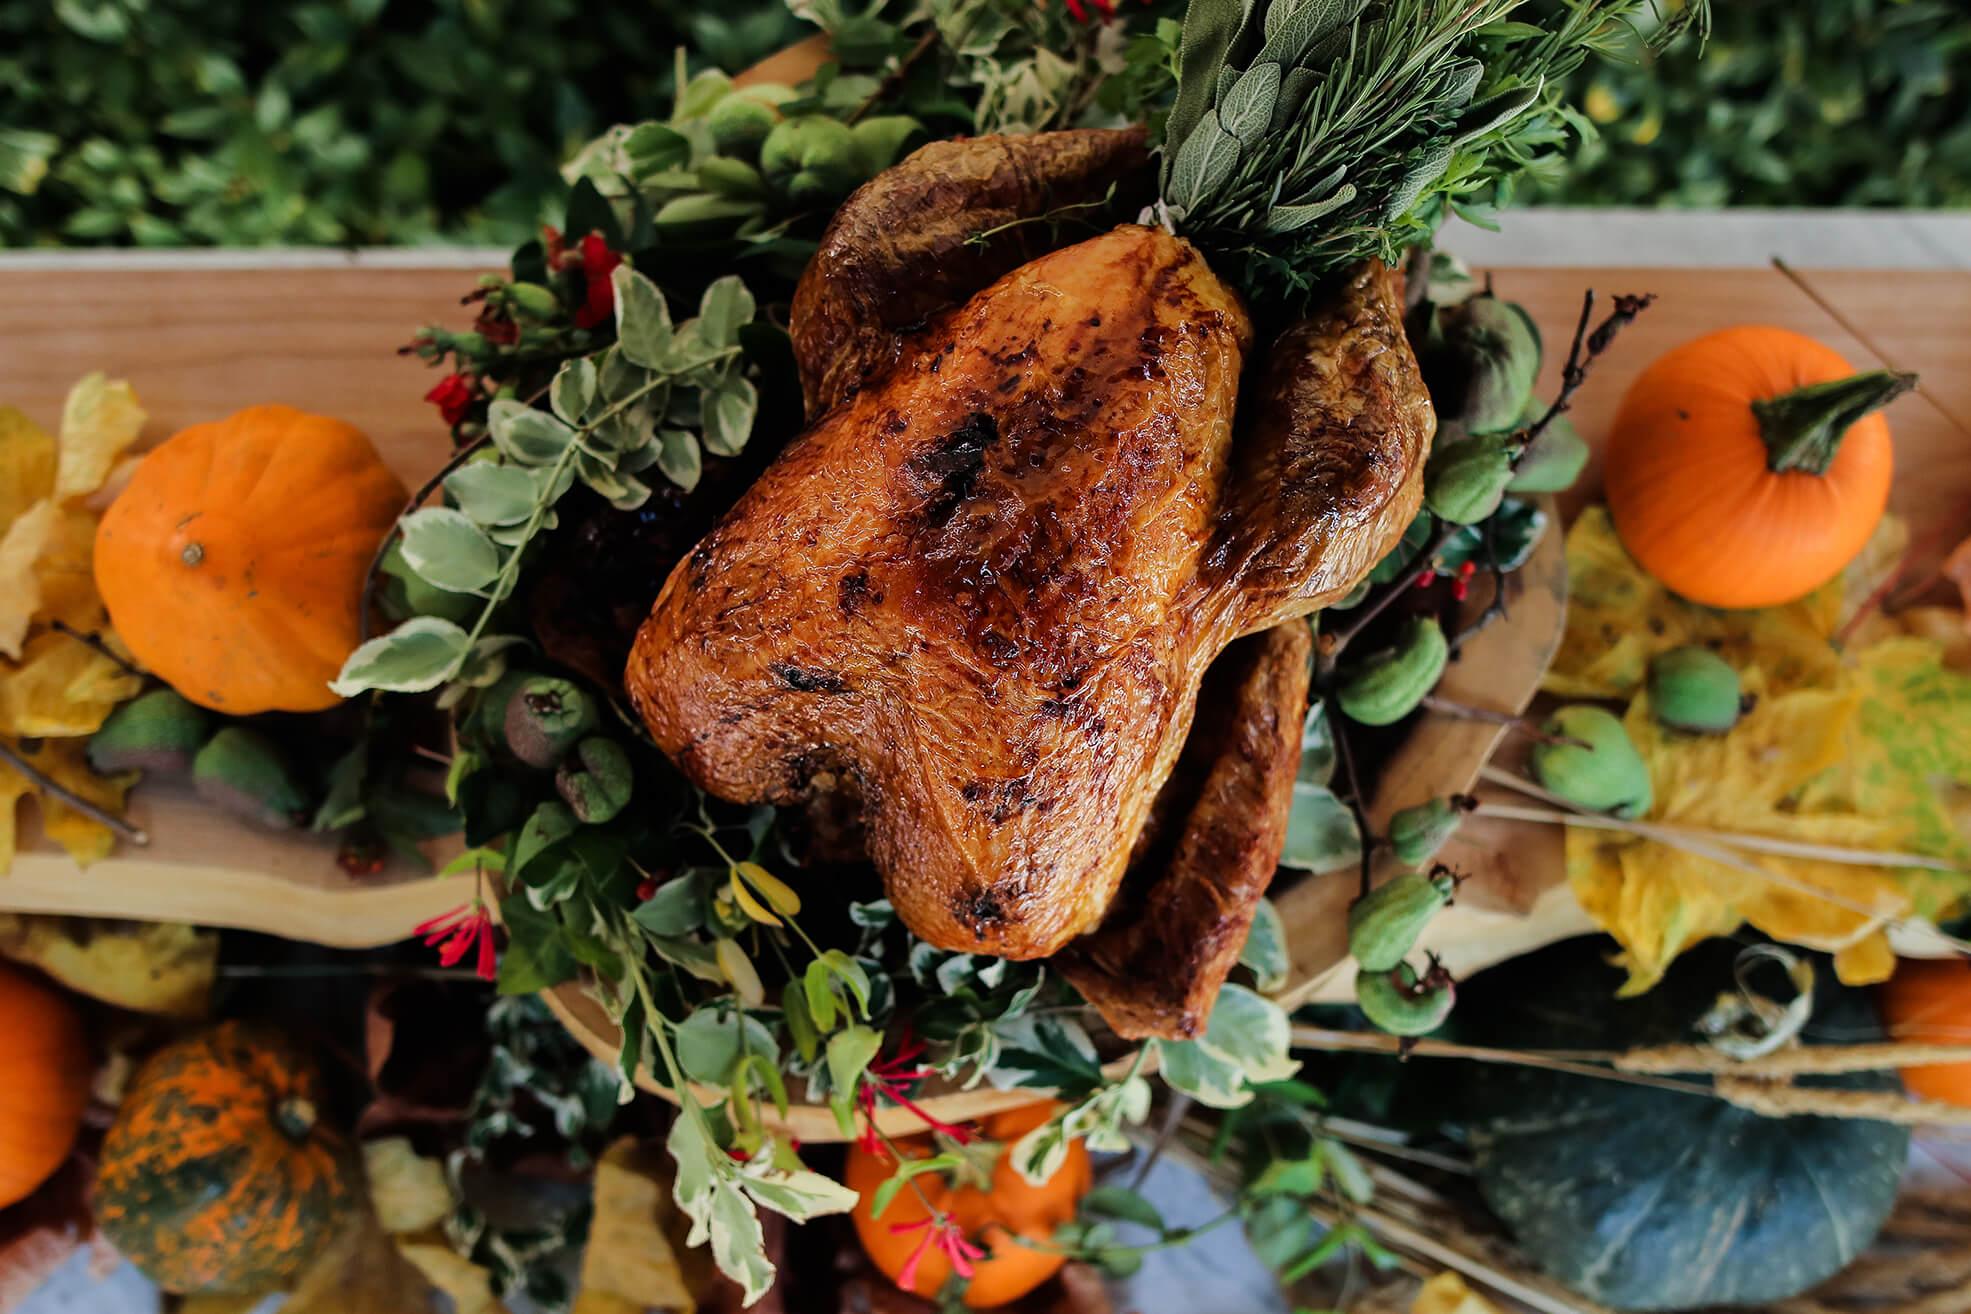 Roasted Fraser Valley turkey | Photo provided by SMC Communications